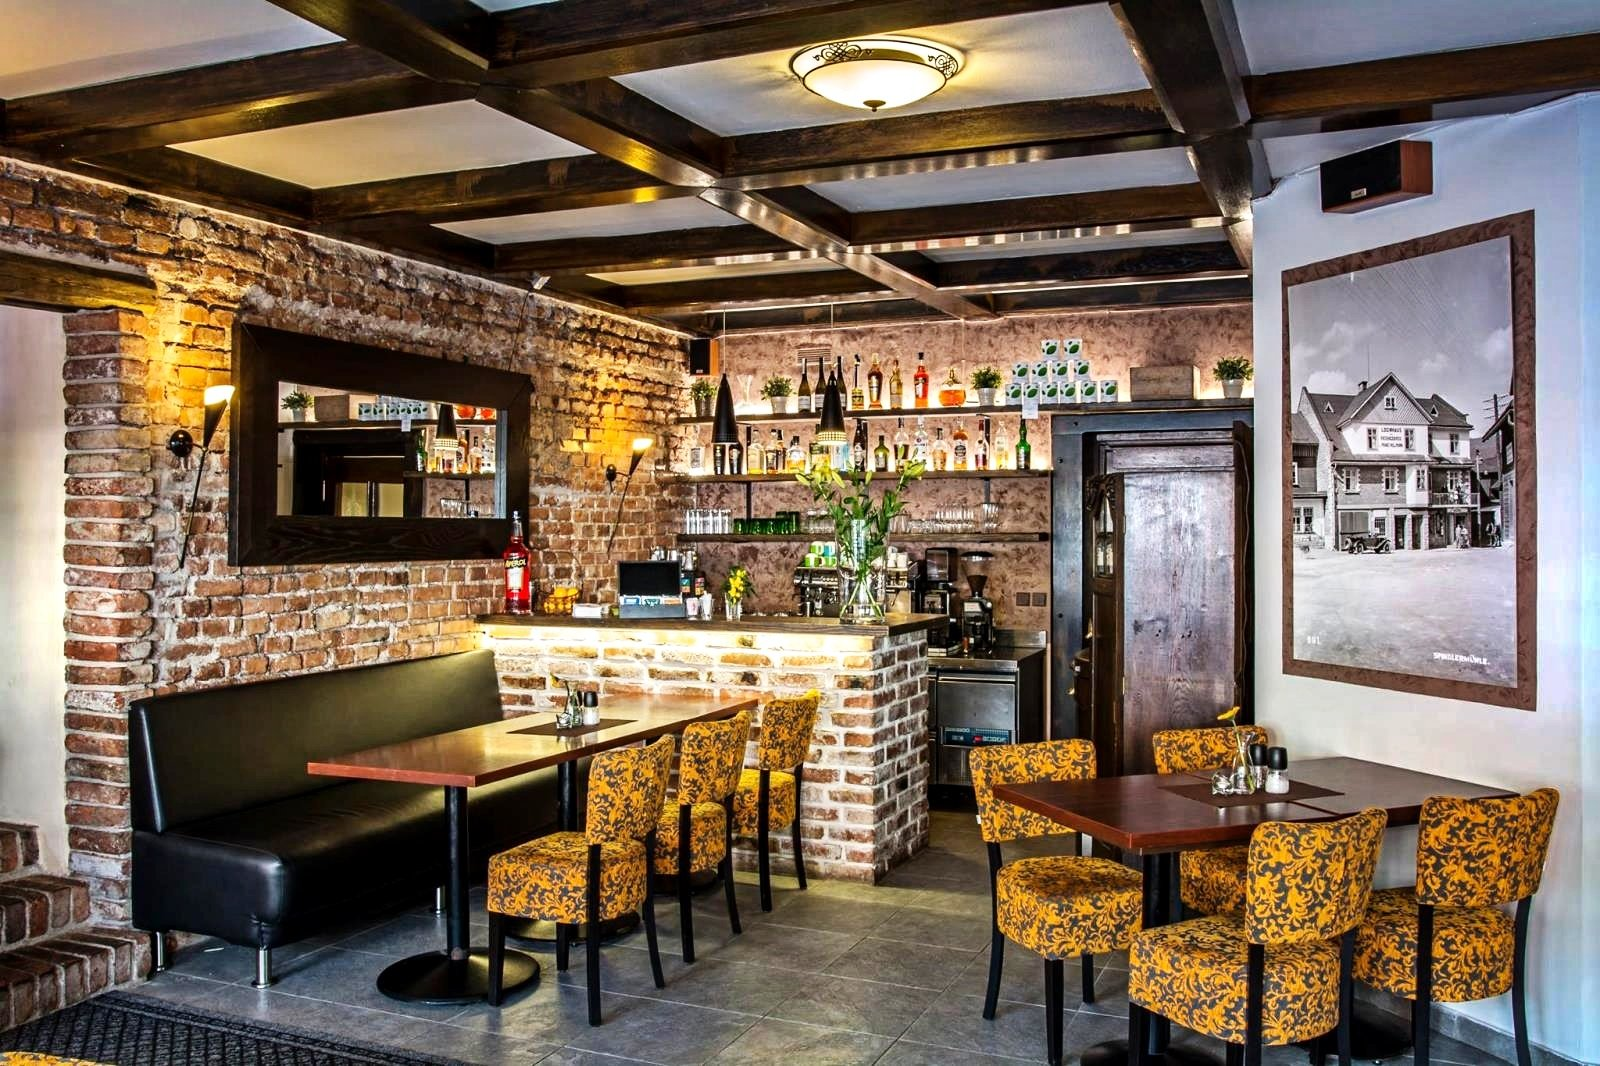 Restaurace Lomnice - Špindlerův Mlýn - Krkonoše